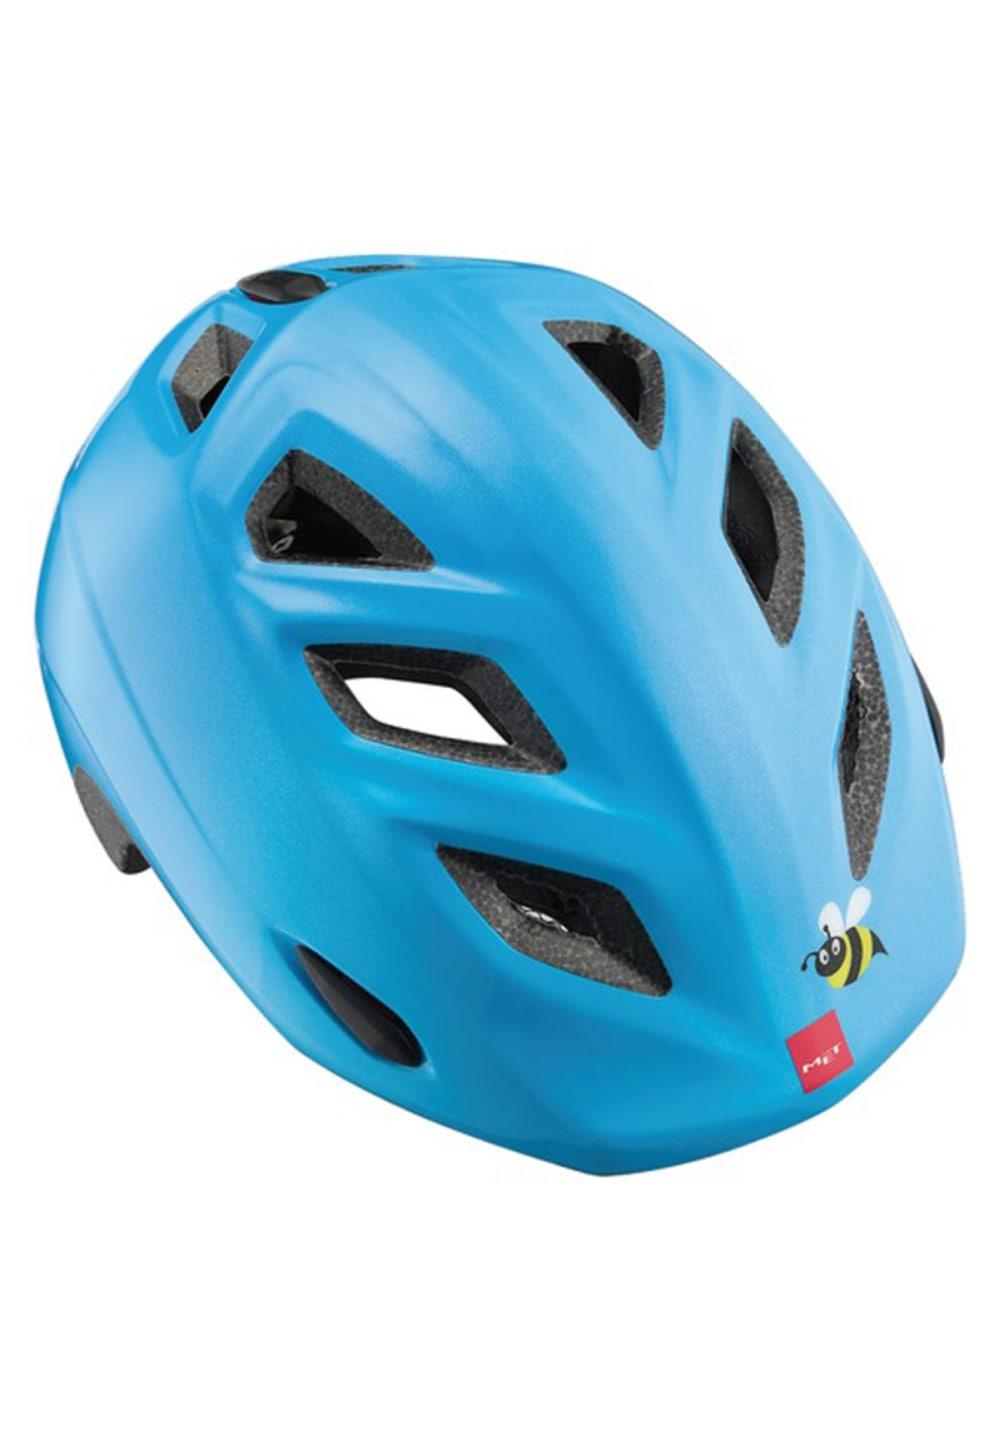 MET Elfo 46-53 cm Kids - Helme für Kinder Unisex - Blau